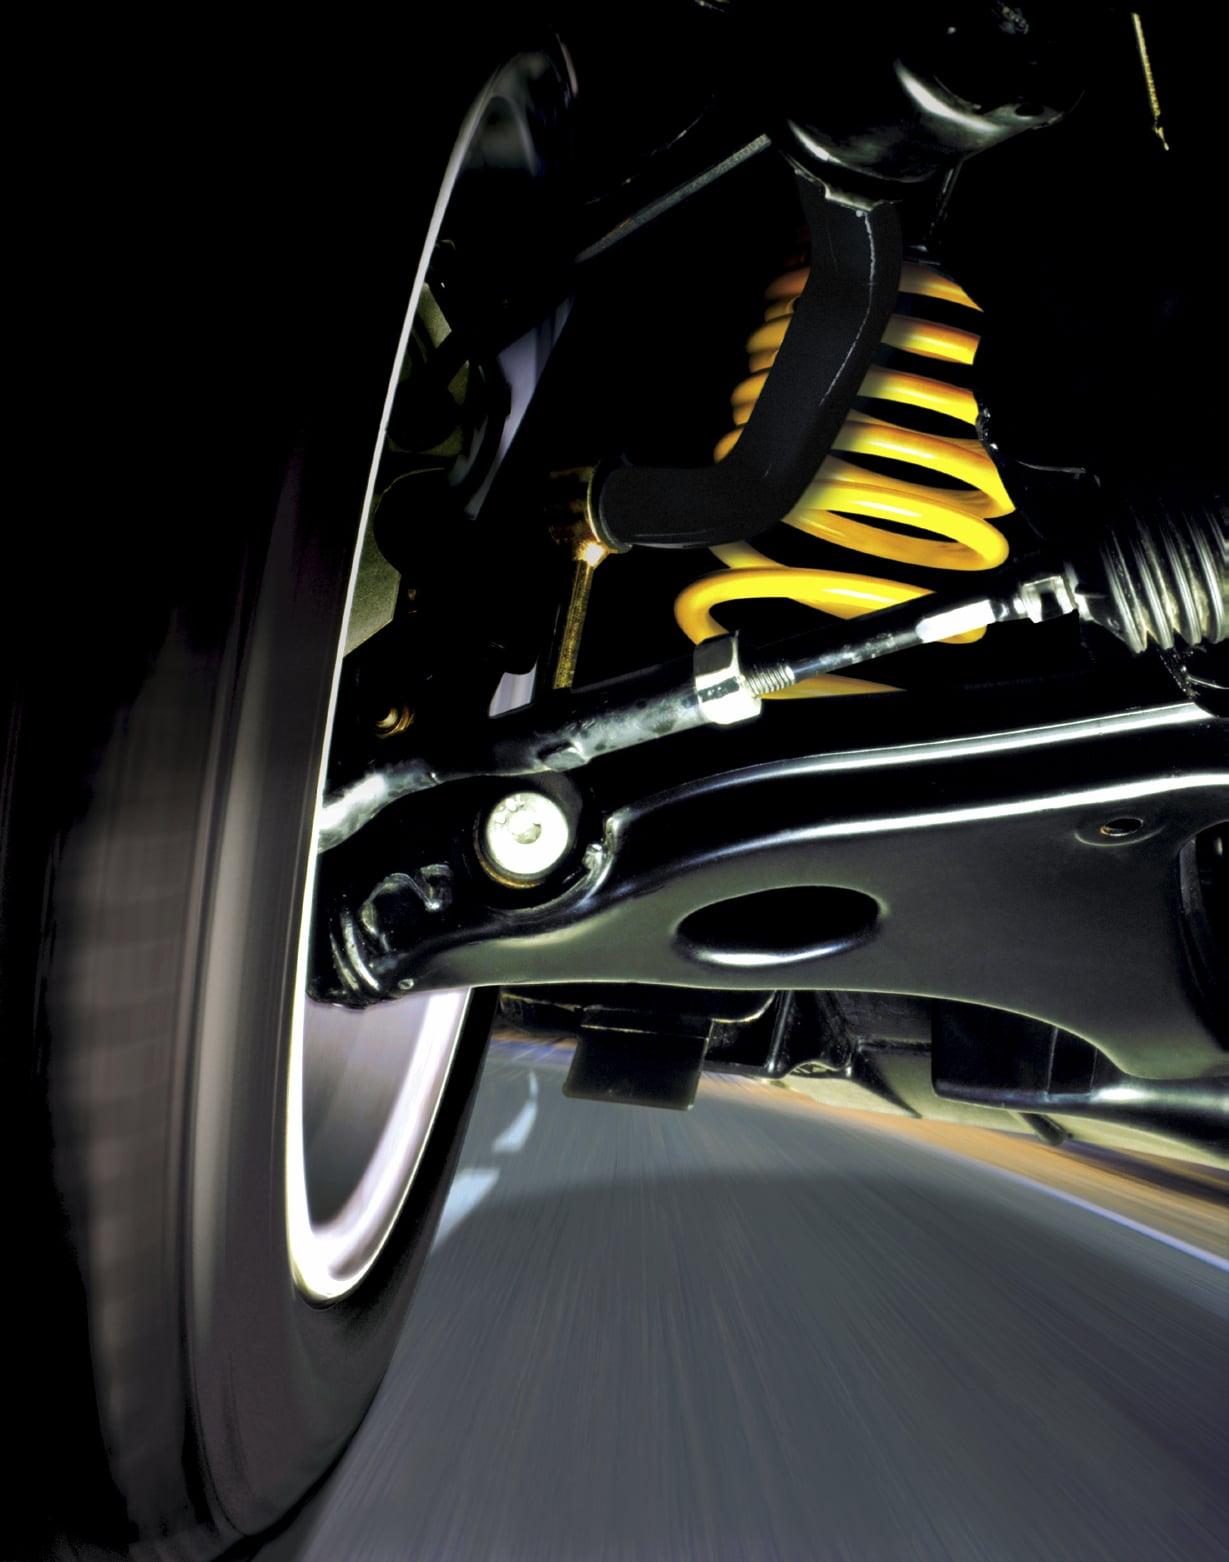 Control Arm Car Repair